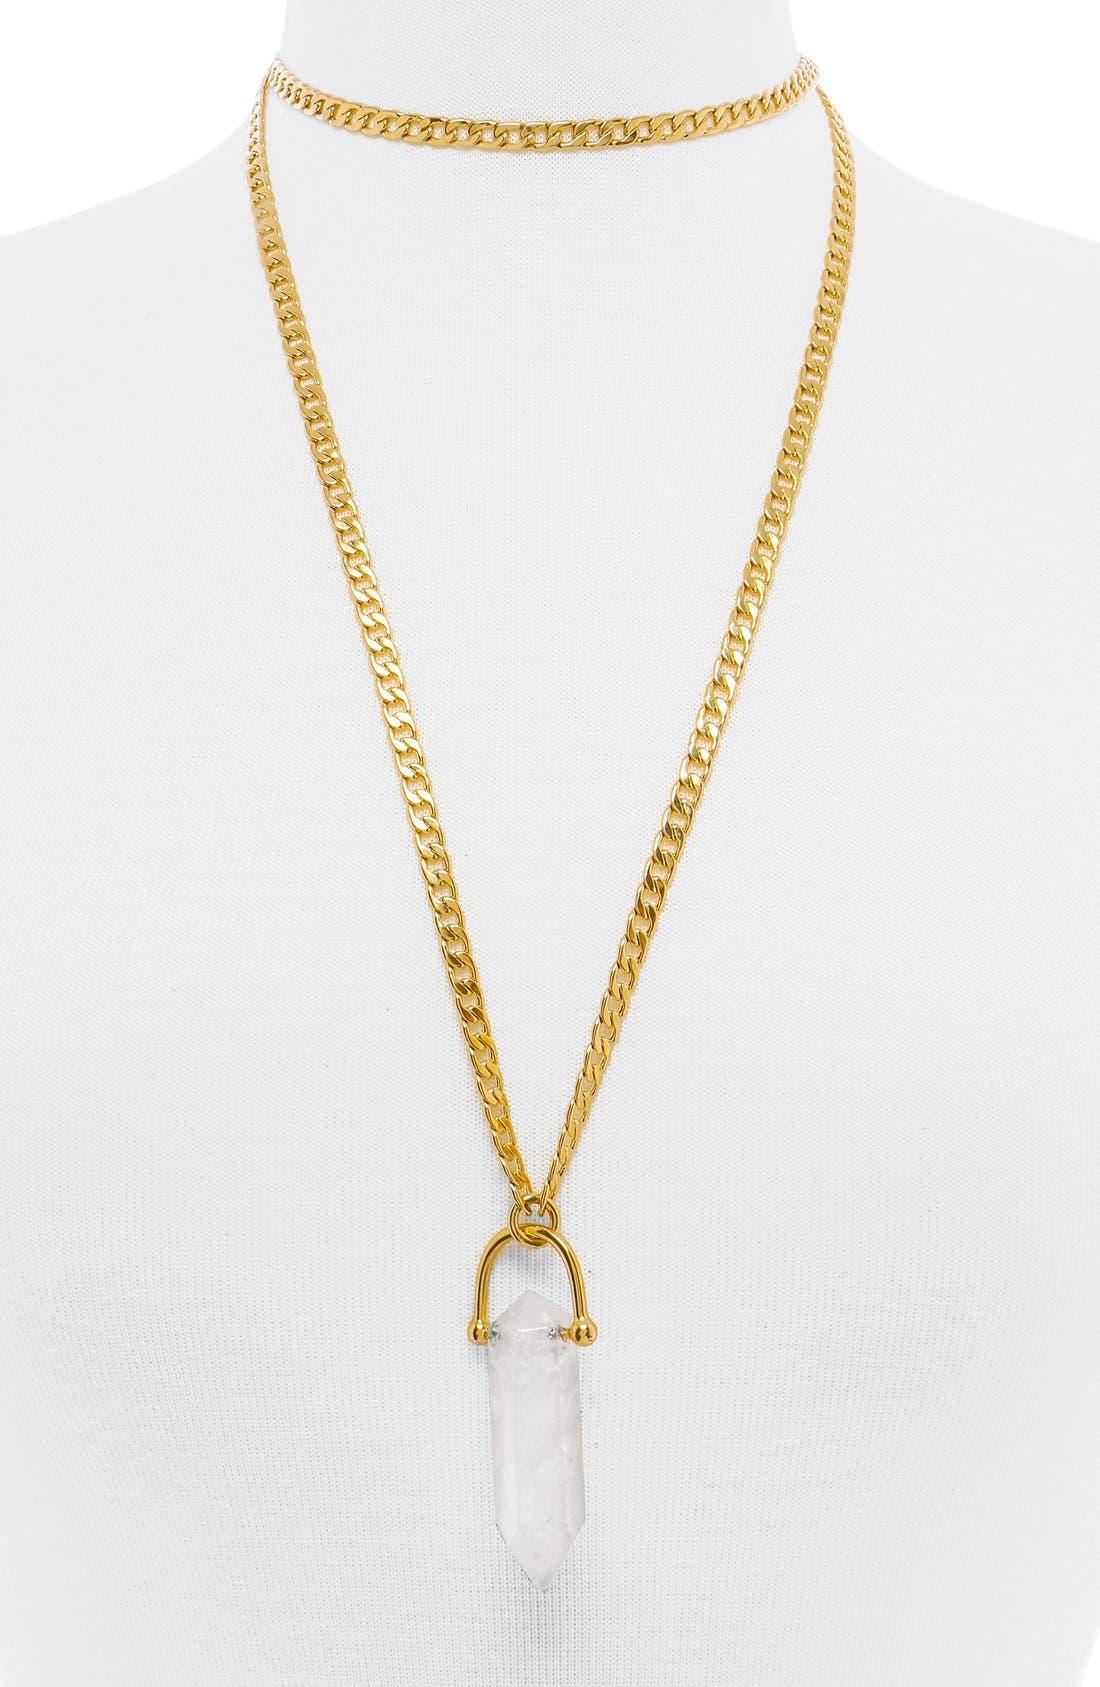 Alternate Image 1 Selected - BaubleBar x Olivia Palermo Quartz Pendant Necklace